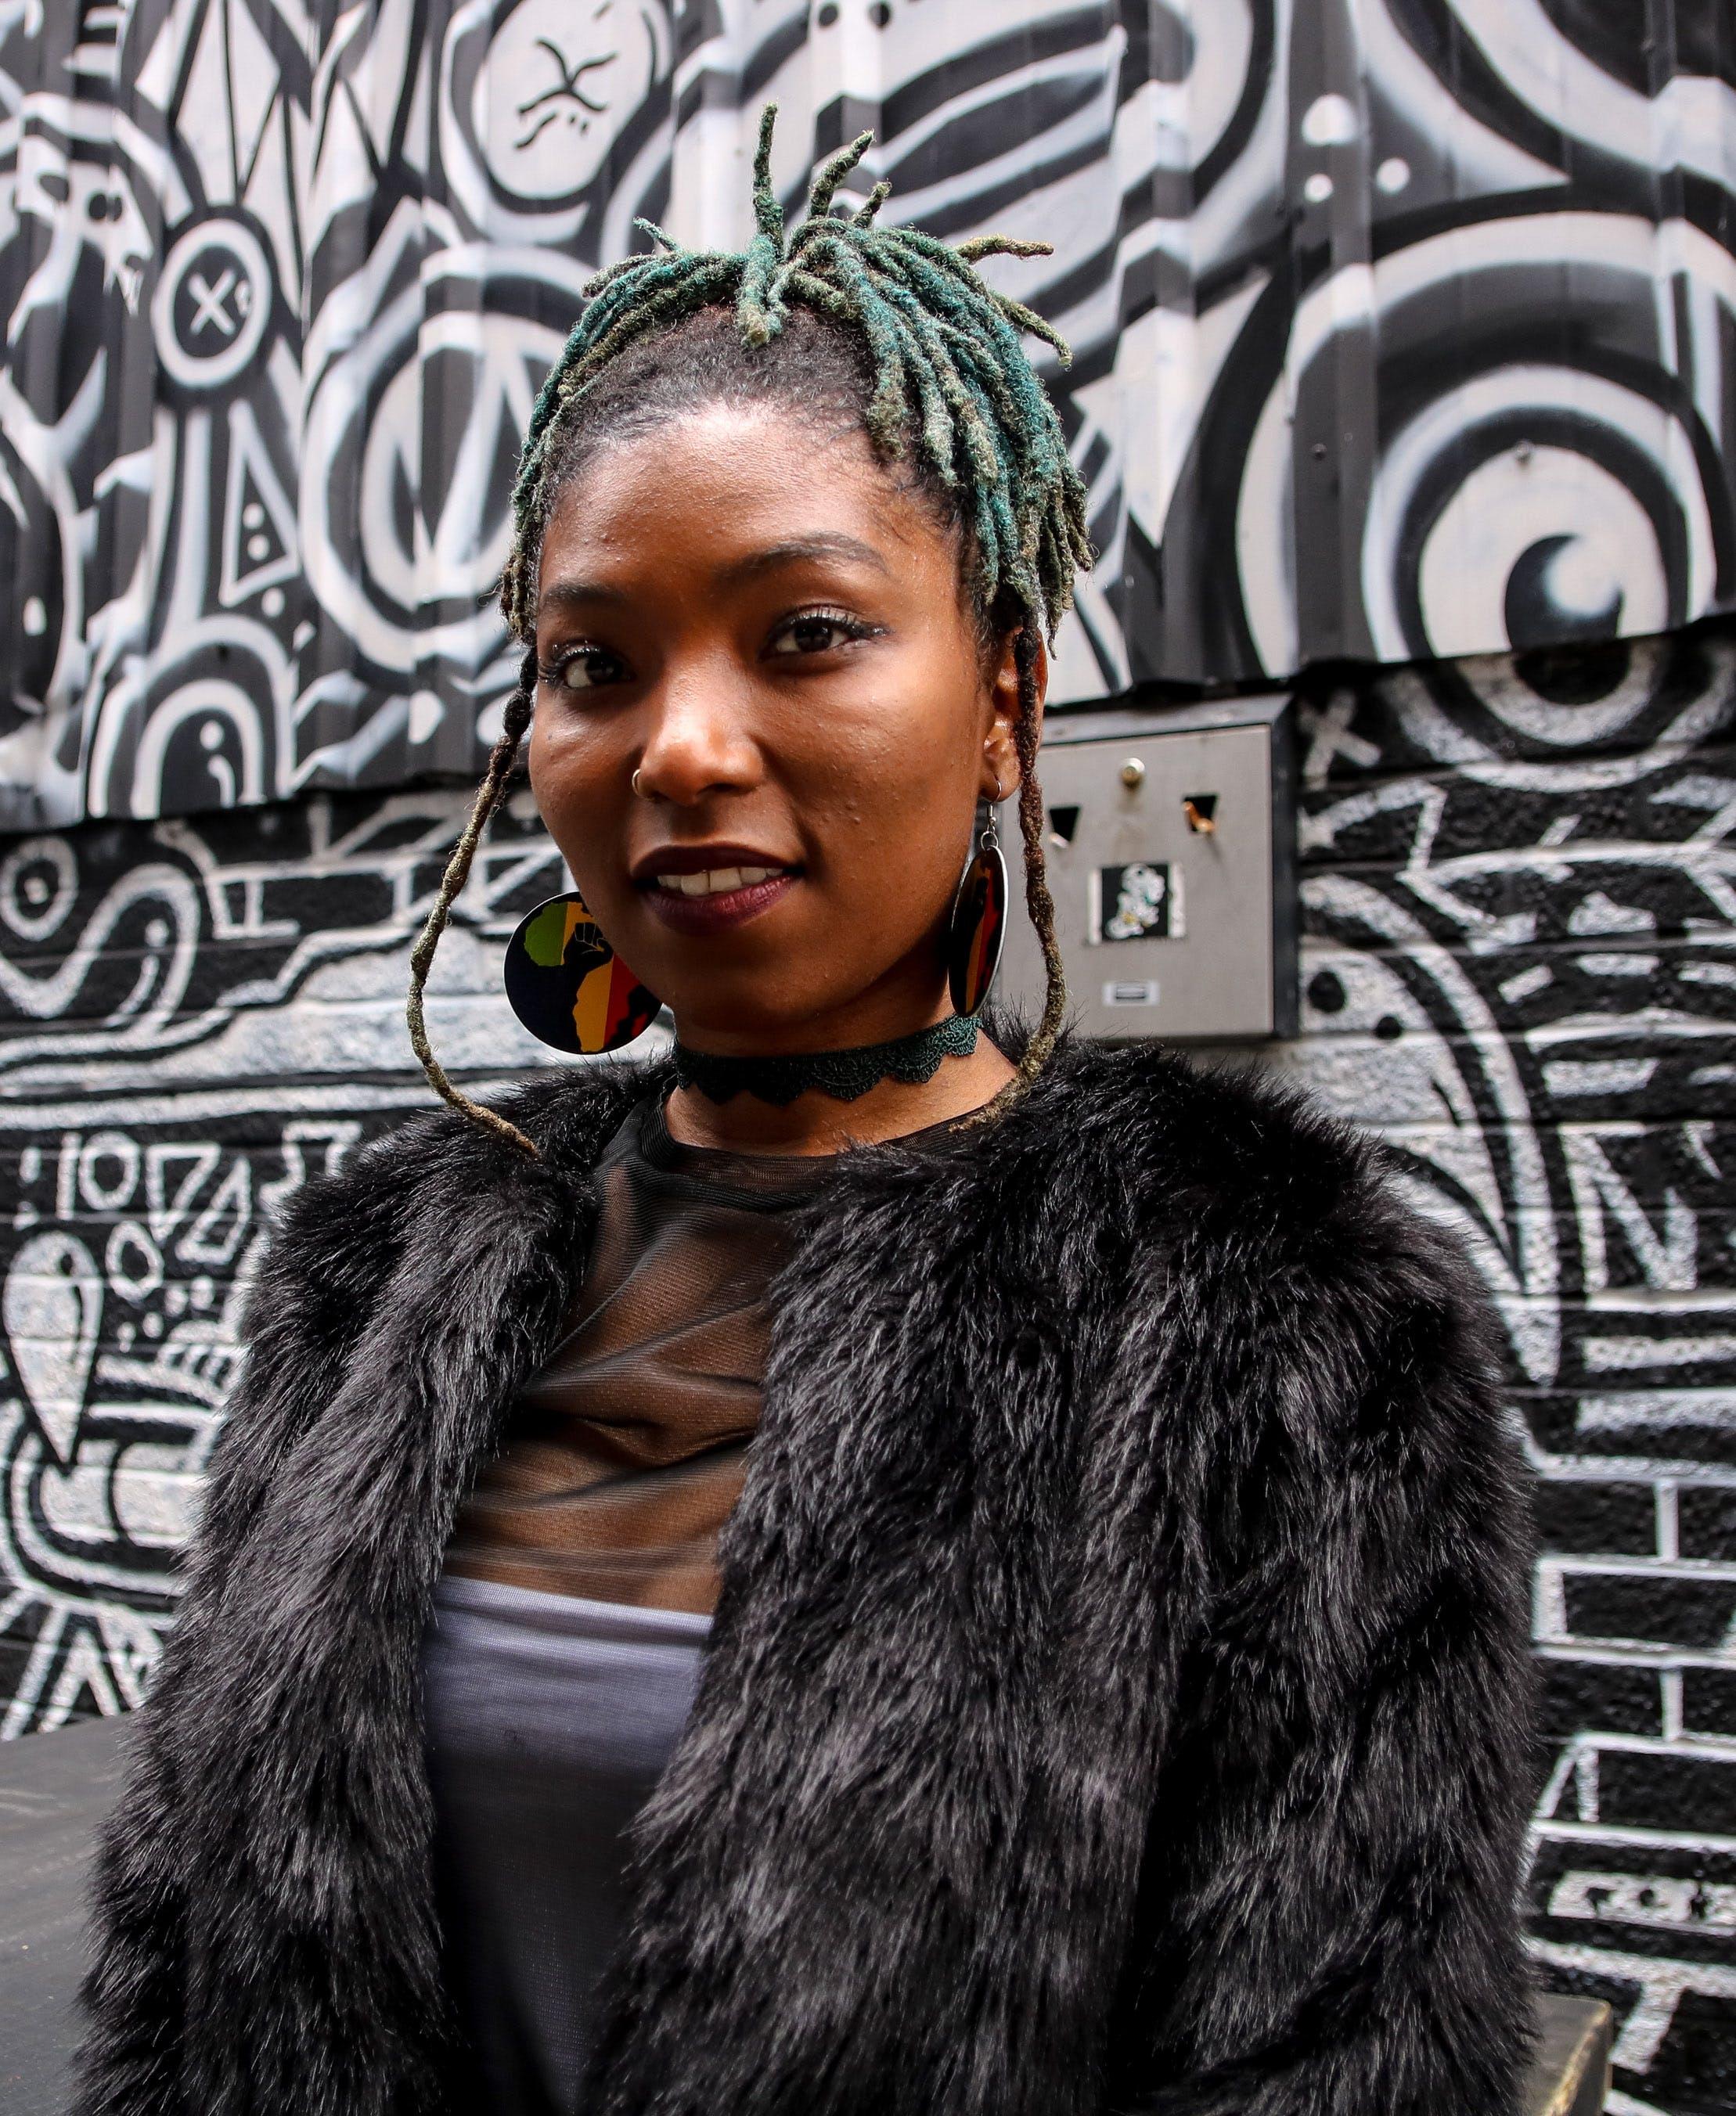 Portrait Photo of Woman in Black Faux Fur Coat Standing Next to Graffiti